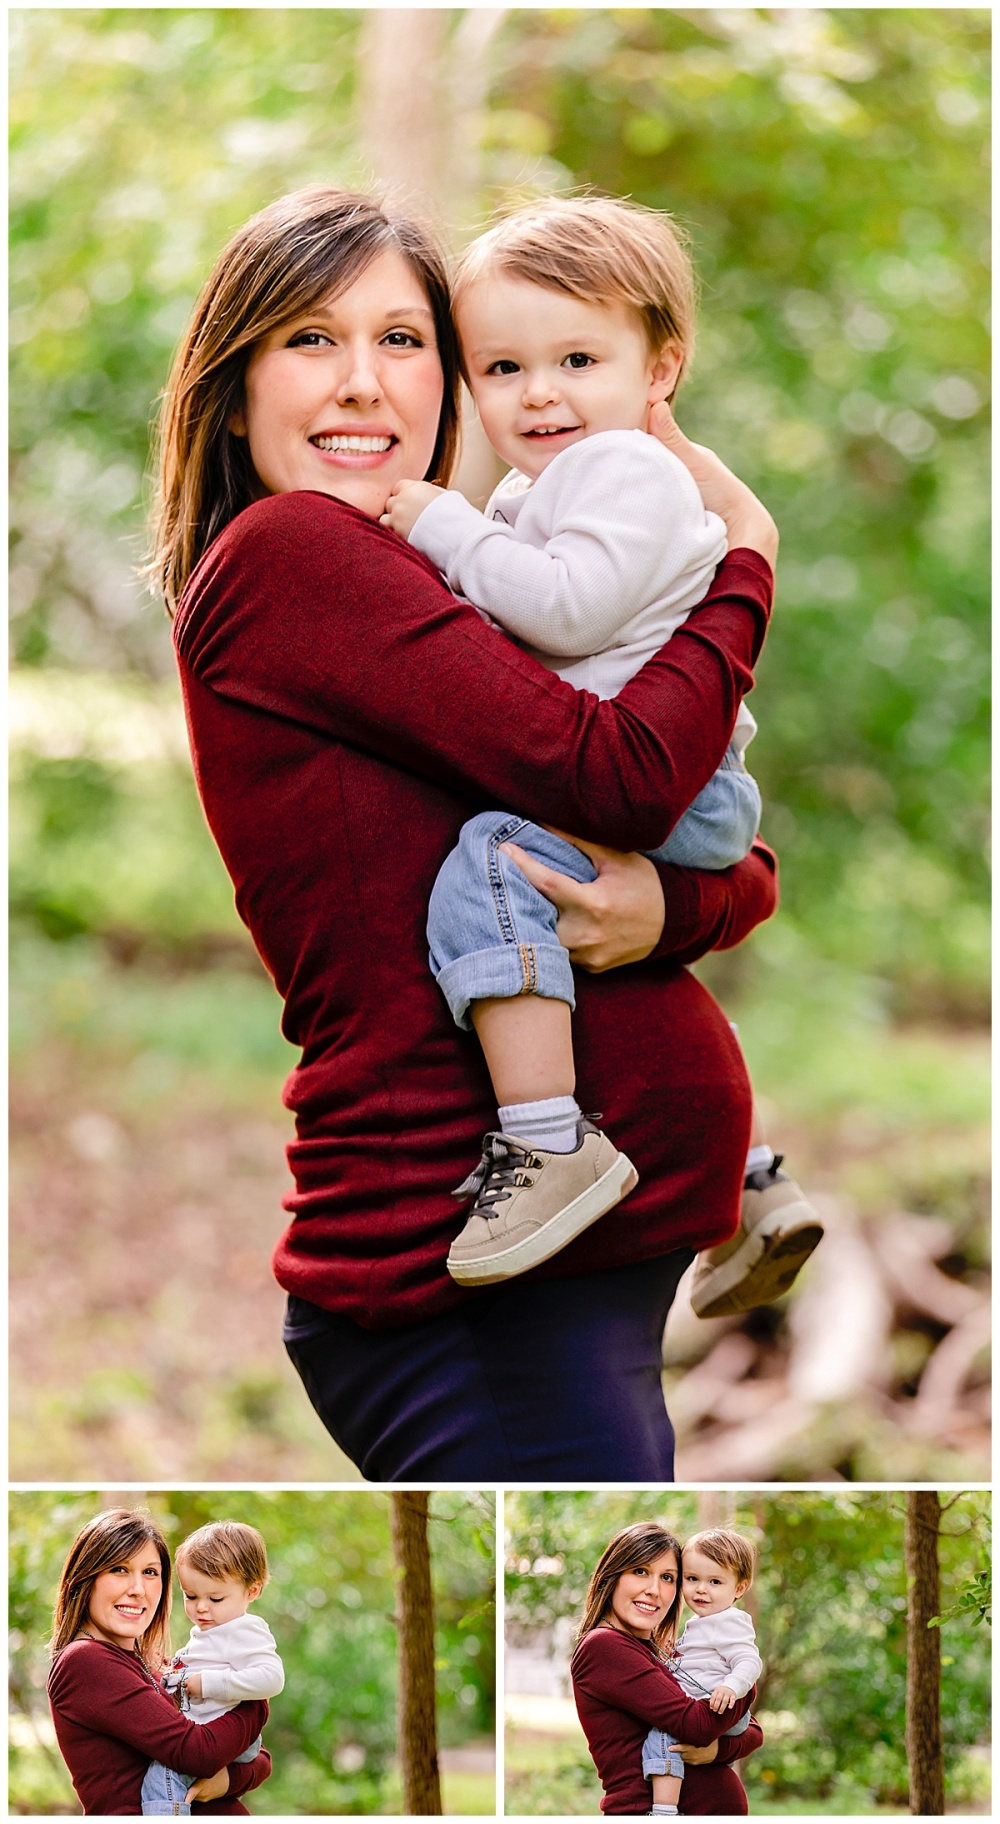 Family-Photographer-Gruene-Texas-Fall-Carly-Barton-Photography_0007.jpg